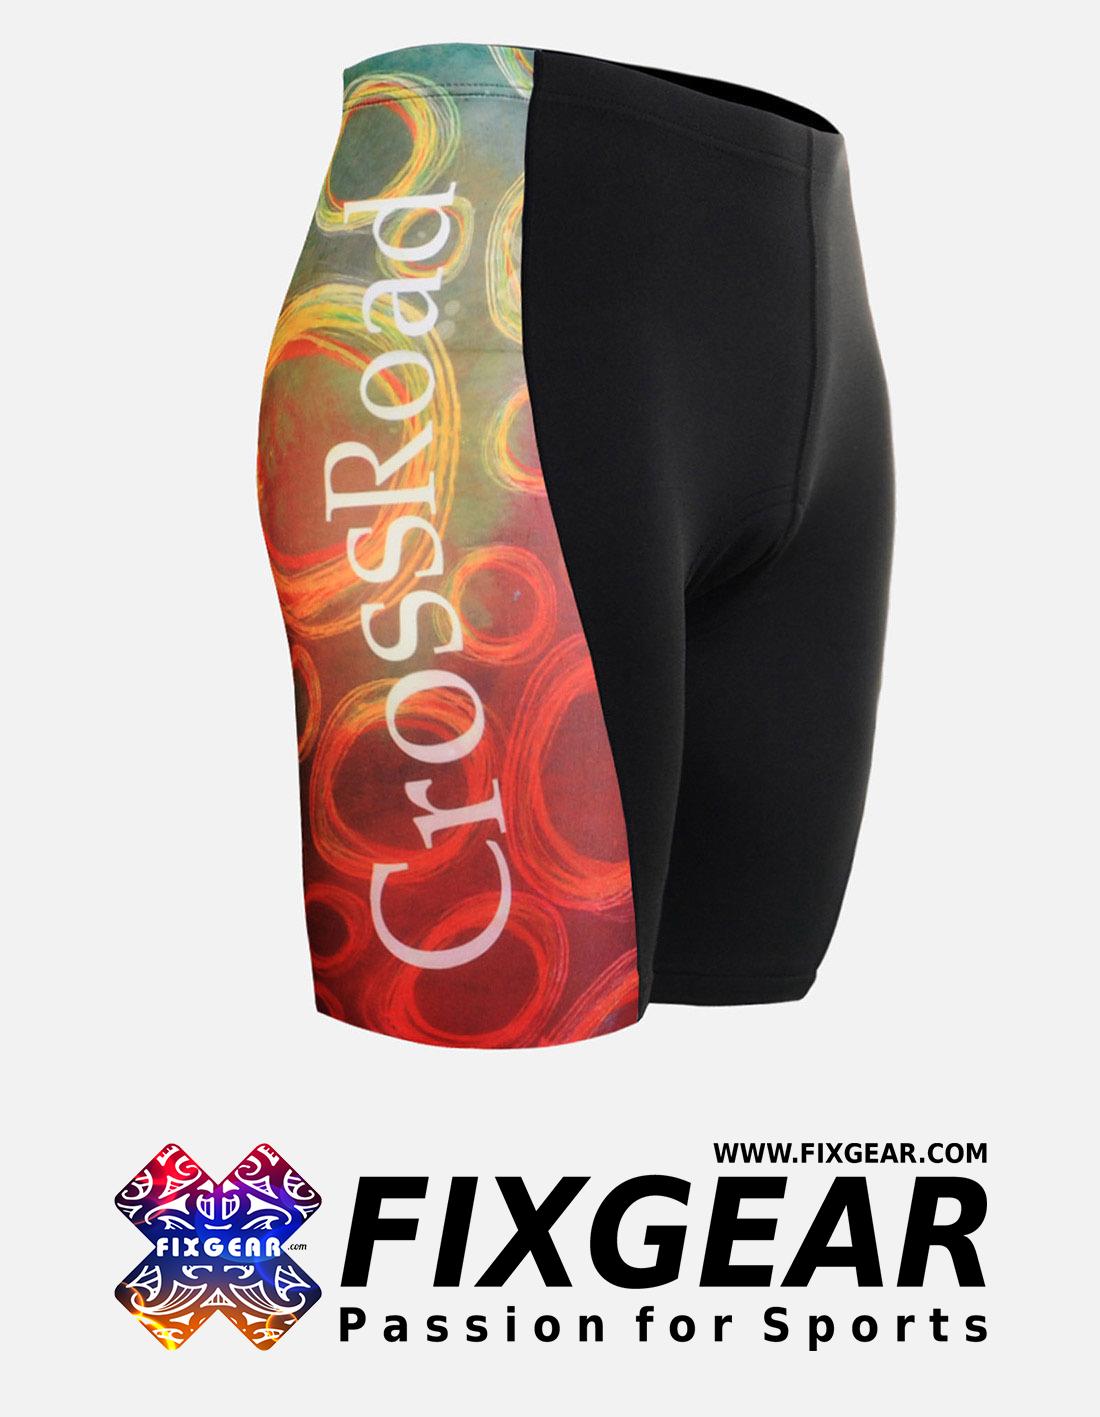 FIXGEAR ST-W4 Women's Cycling Padded Shorts